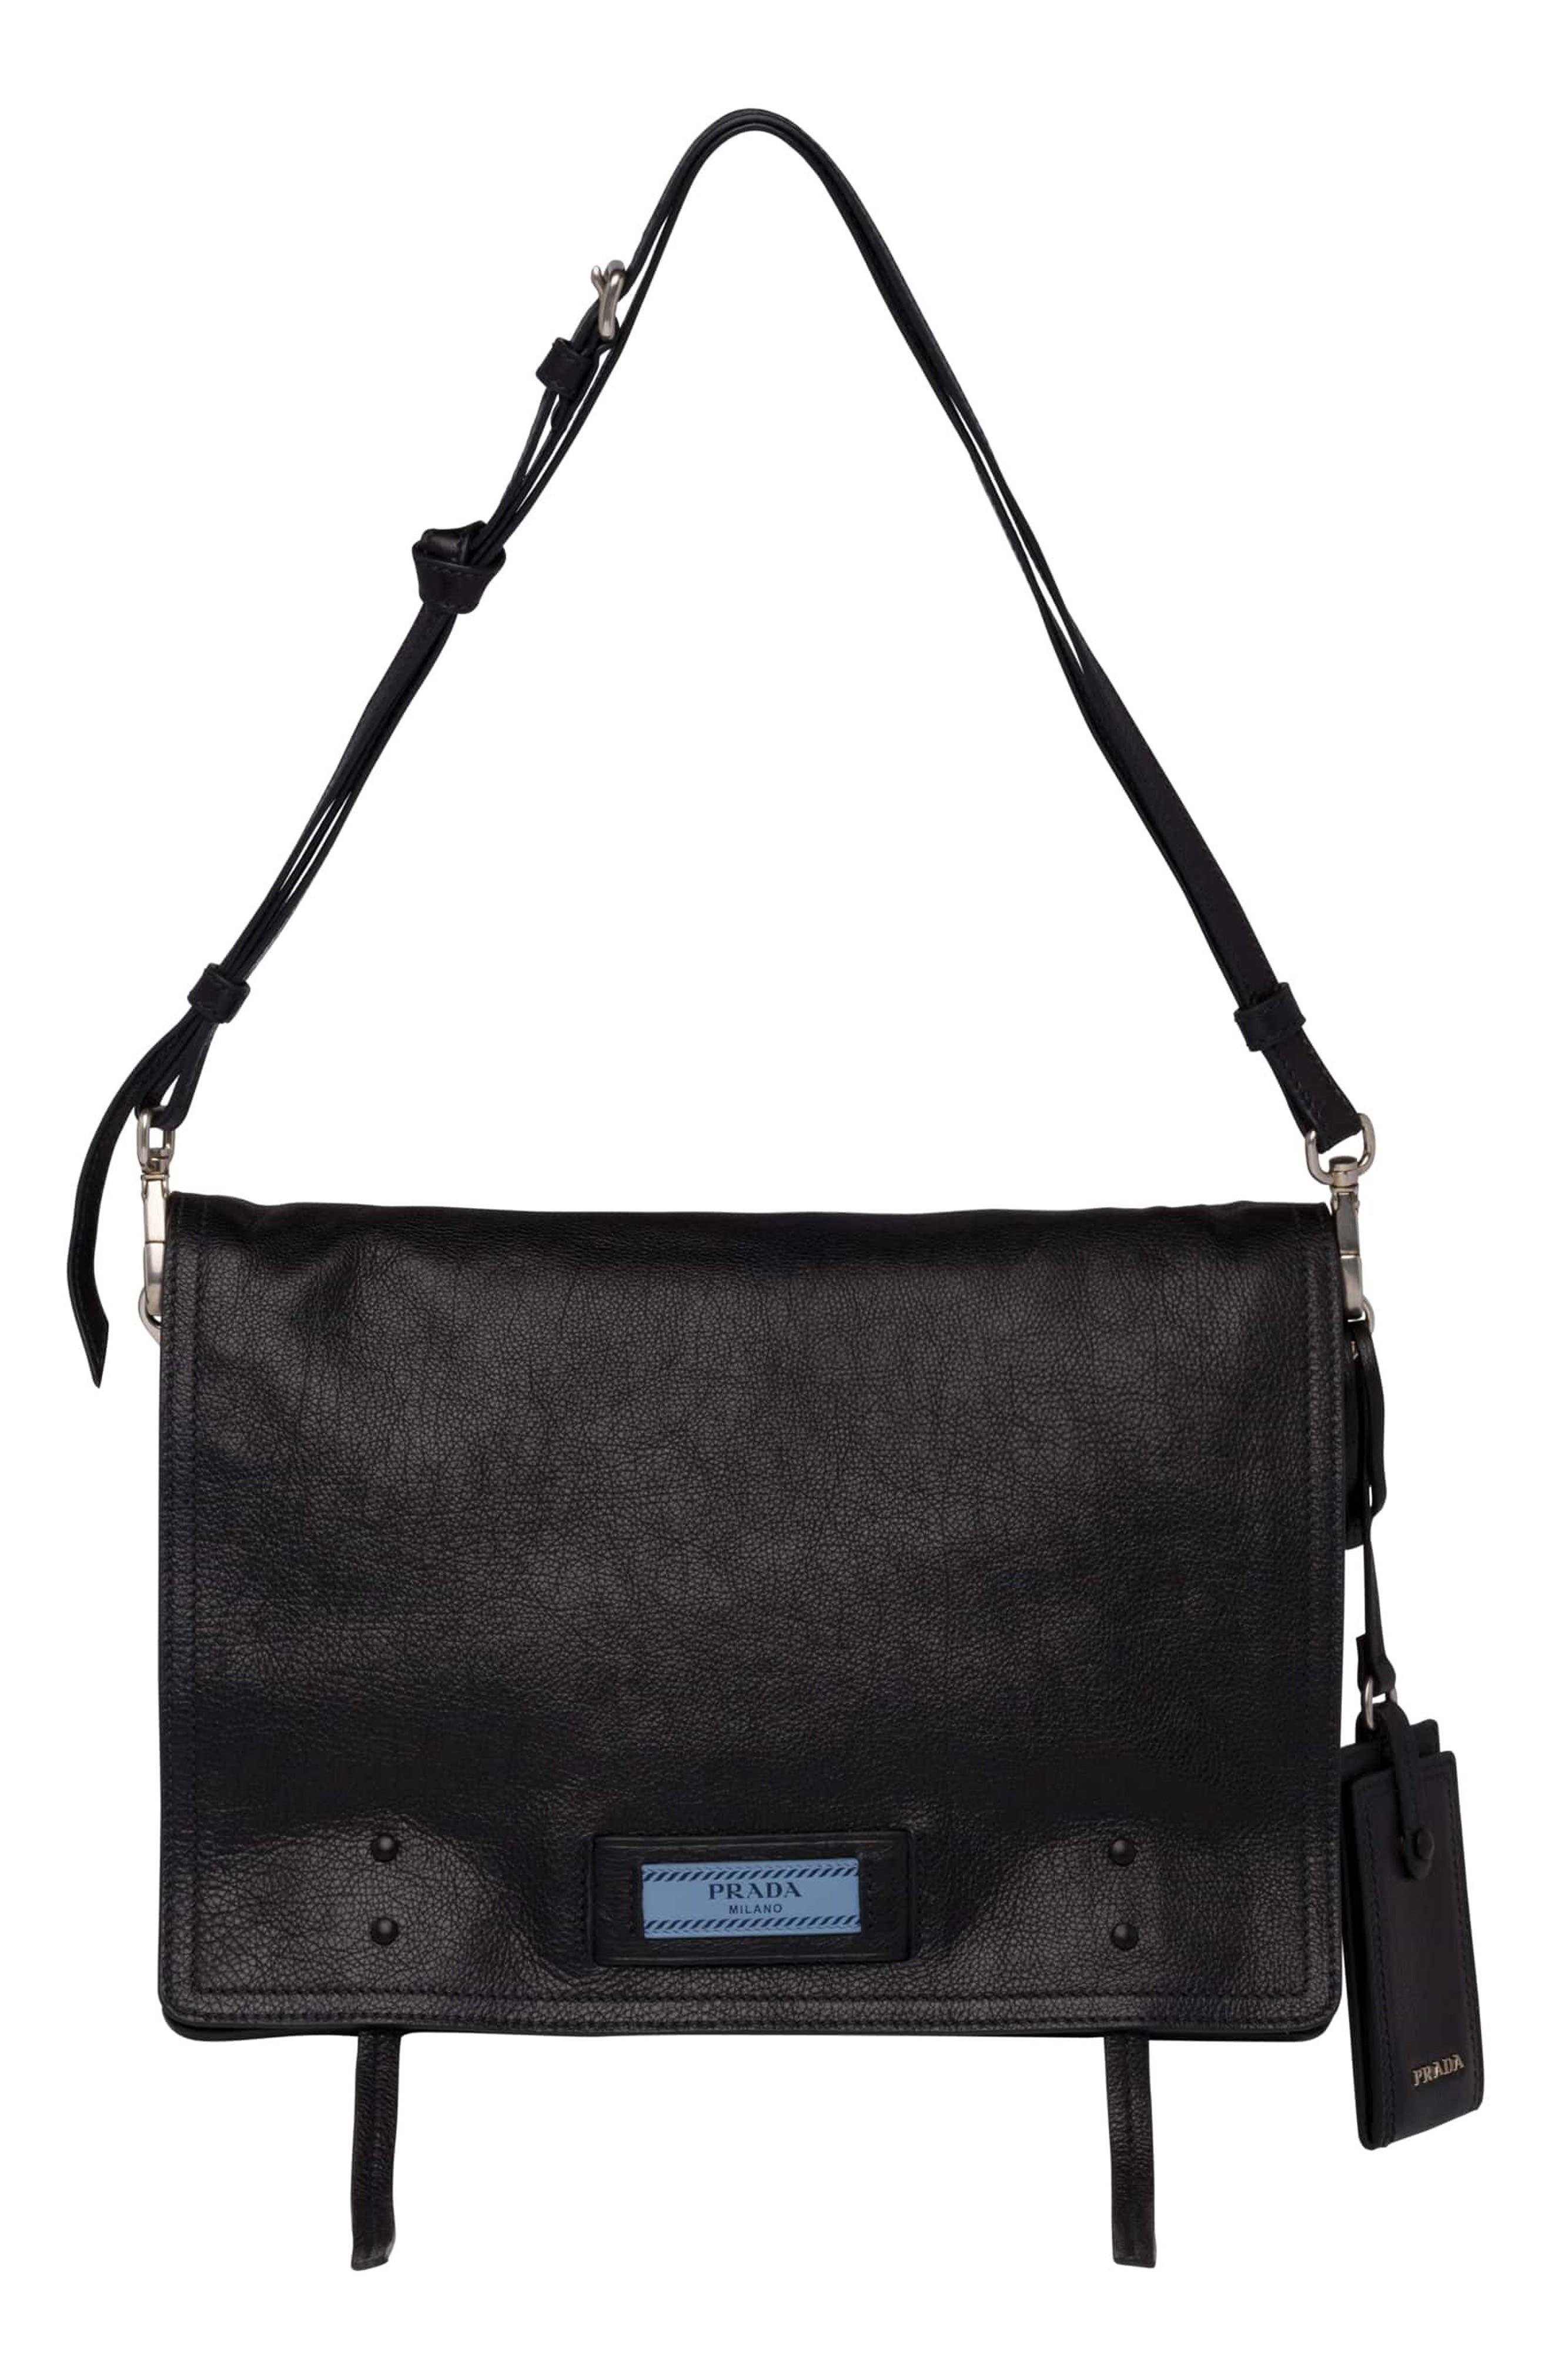 Alternate Image 1 Selected - Prada Cahier Glace Messenger Bag